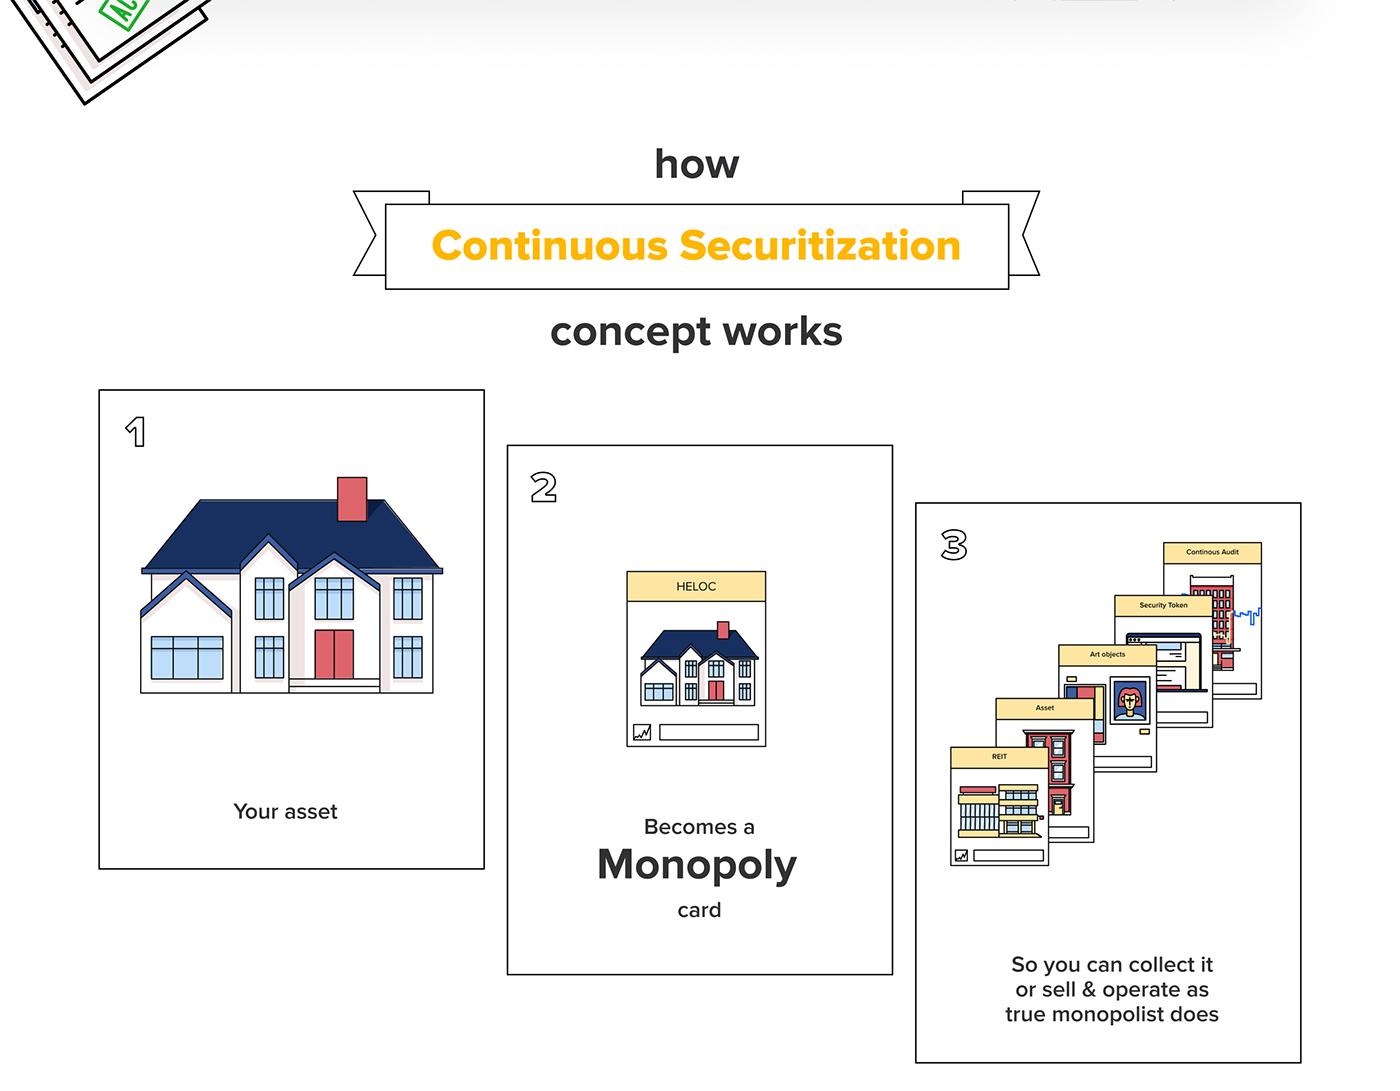 bankex crypto lineart Monopoly tokenization